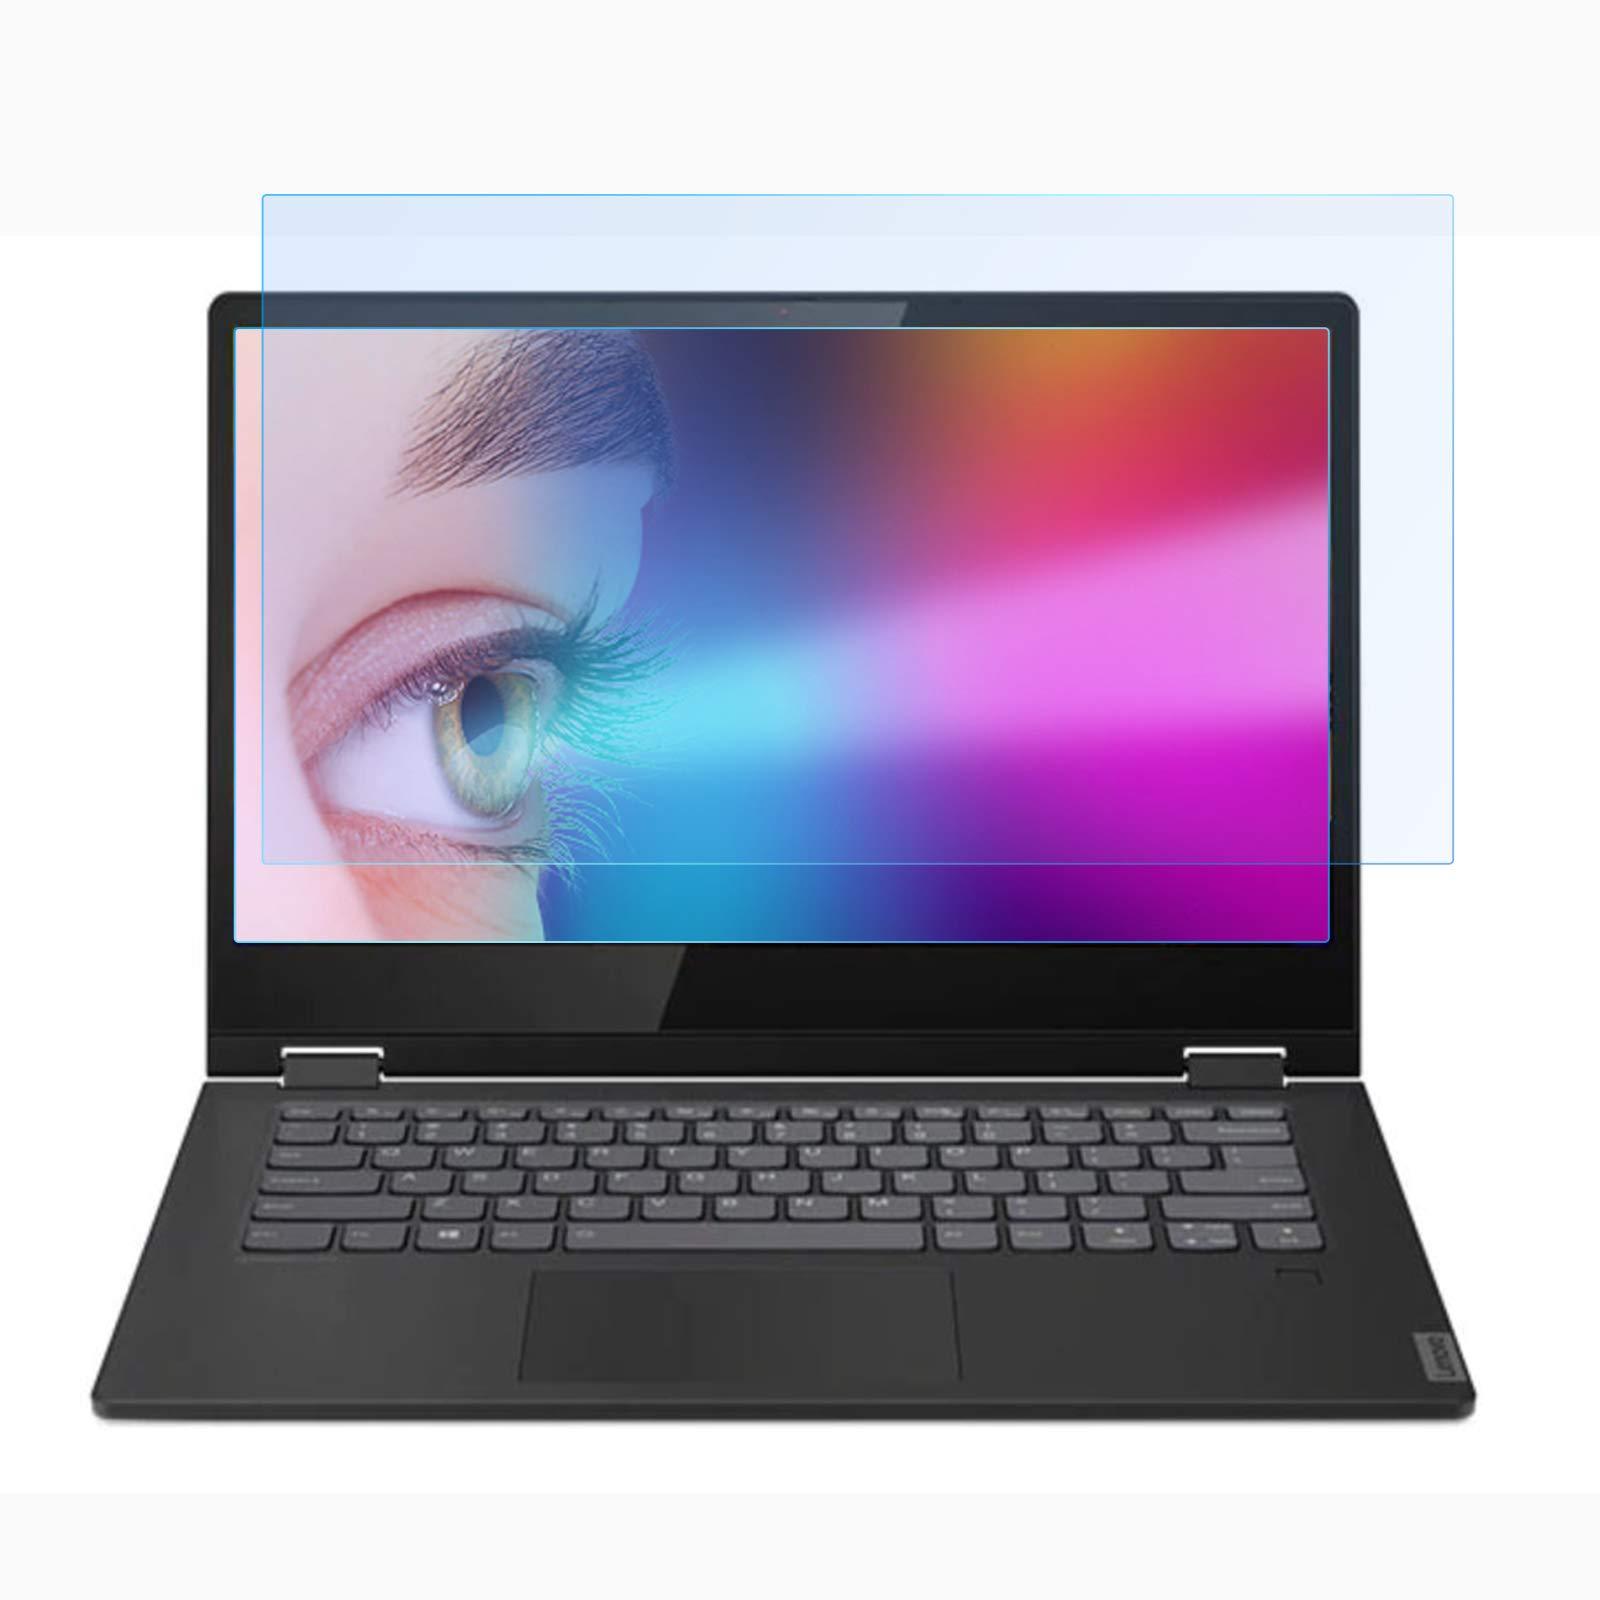 "14 Inch Blue Light Screen Protector Laptop Anti Glare Filter Eye Protection Blue Light Blocking Screen Protector for 14"" with Display 16:9 Laptops (for 14 inch laptop)"